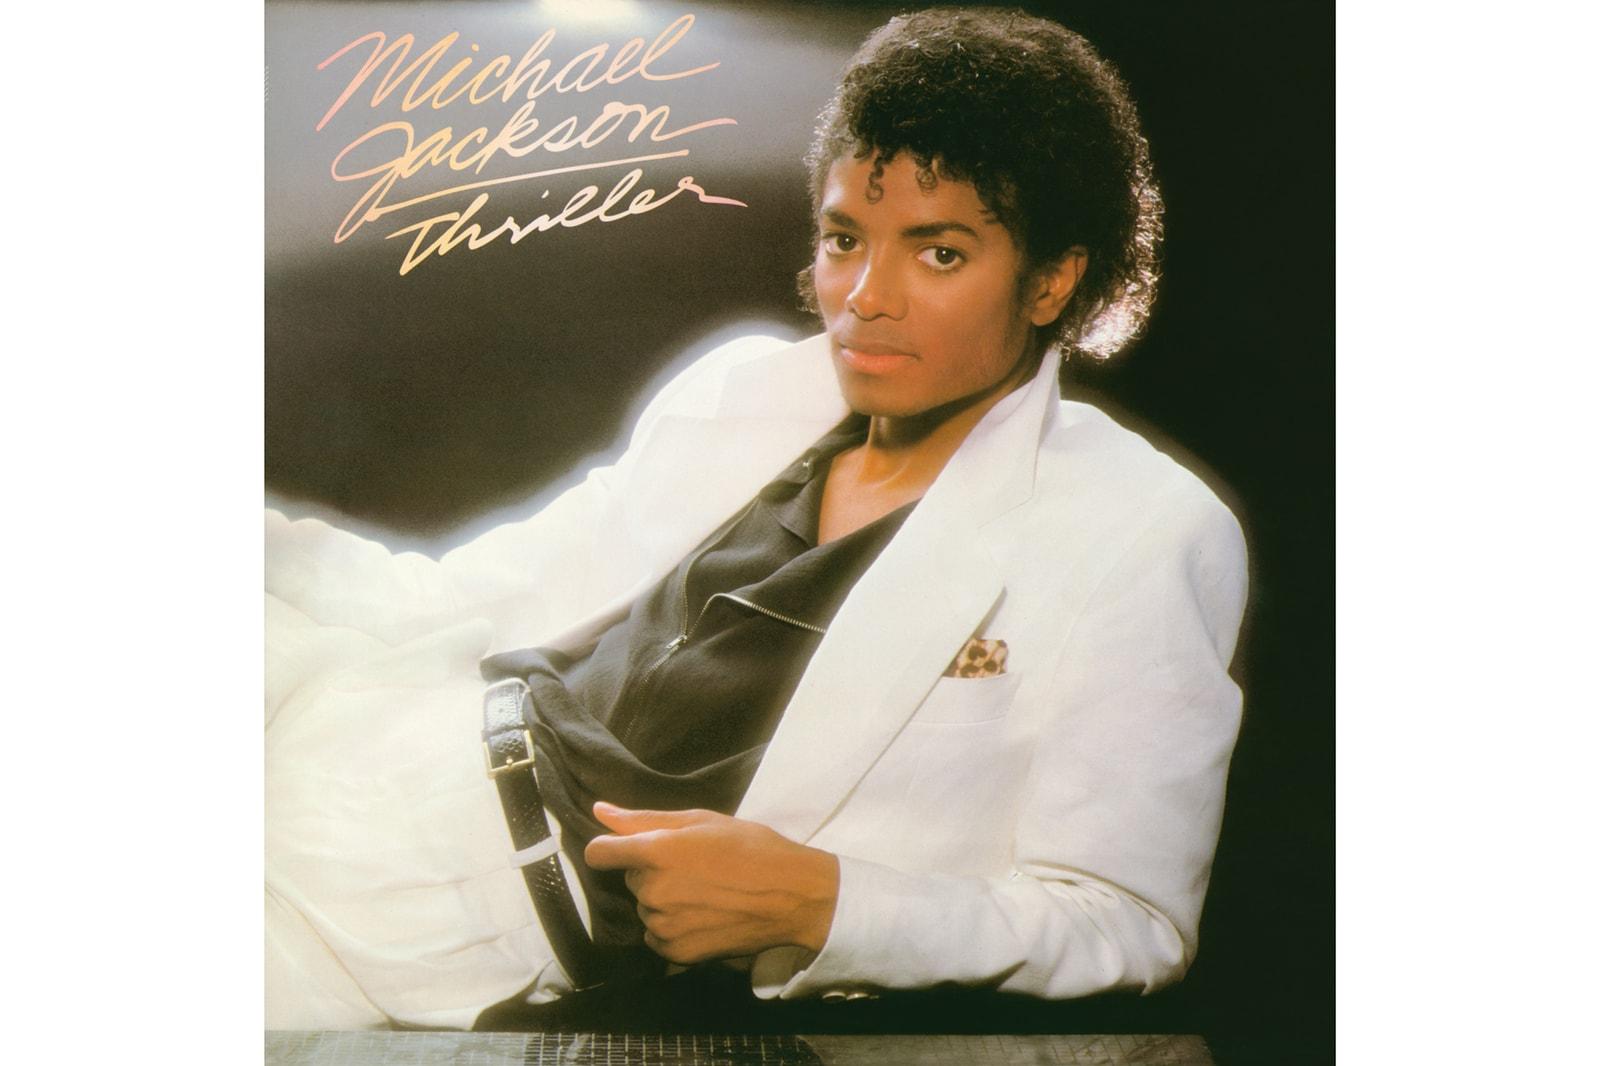 Michael Jackson BOSS Hugo Boss Fall 2018 Capsule Collection suit white t shirt tee king of pop thriller album MJ dance post tee on the wall art print BOSSxMichaelJackson